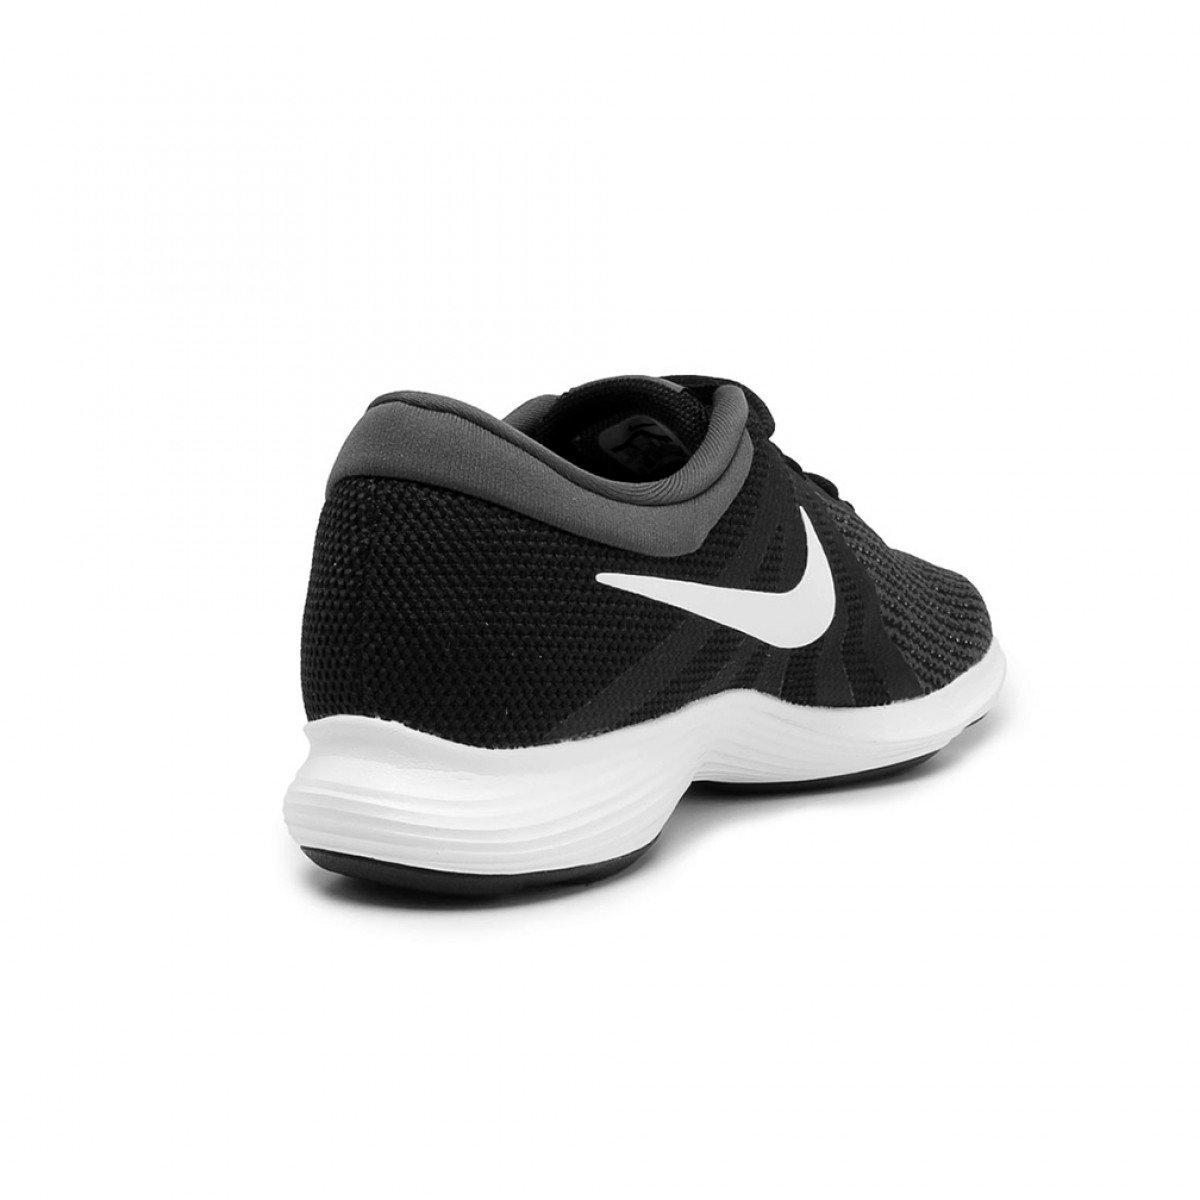 76ace2a423d Tênis Nike Revolution 4 Preto e Branco Masculino - Compre Agora ...